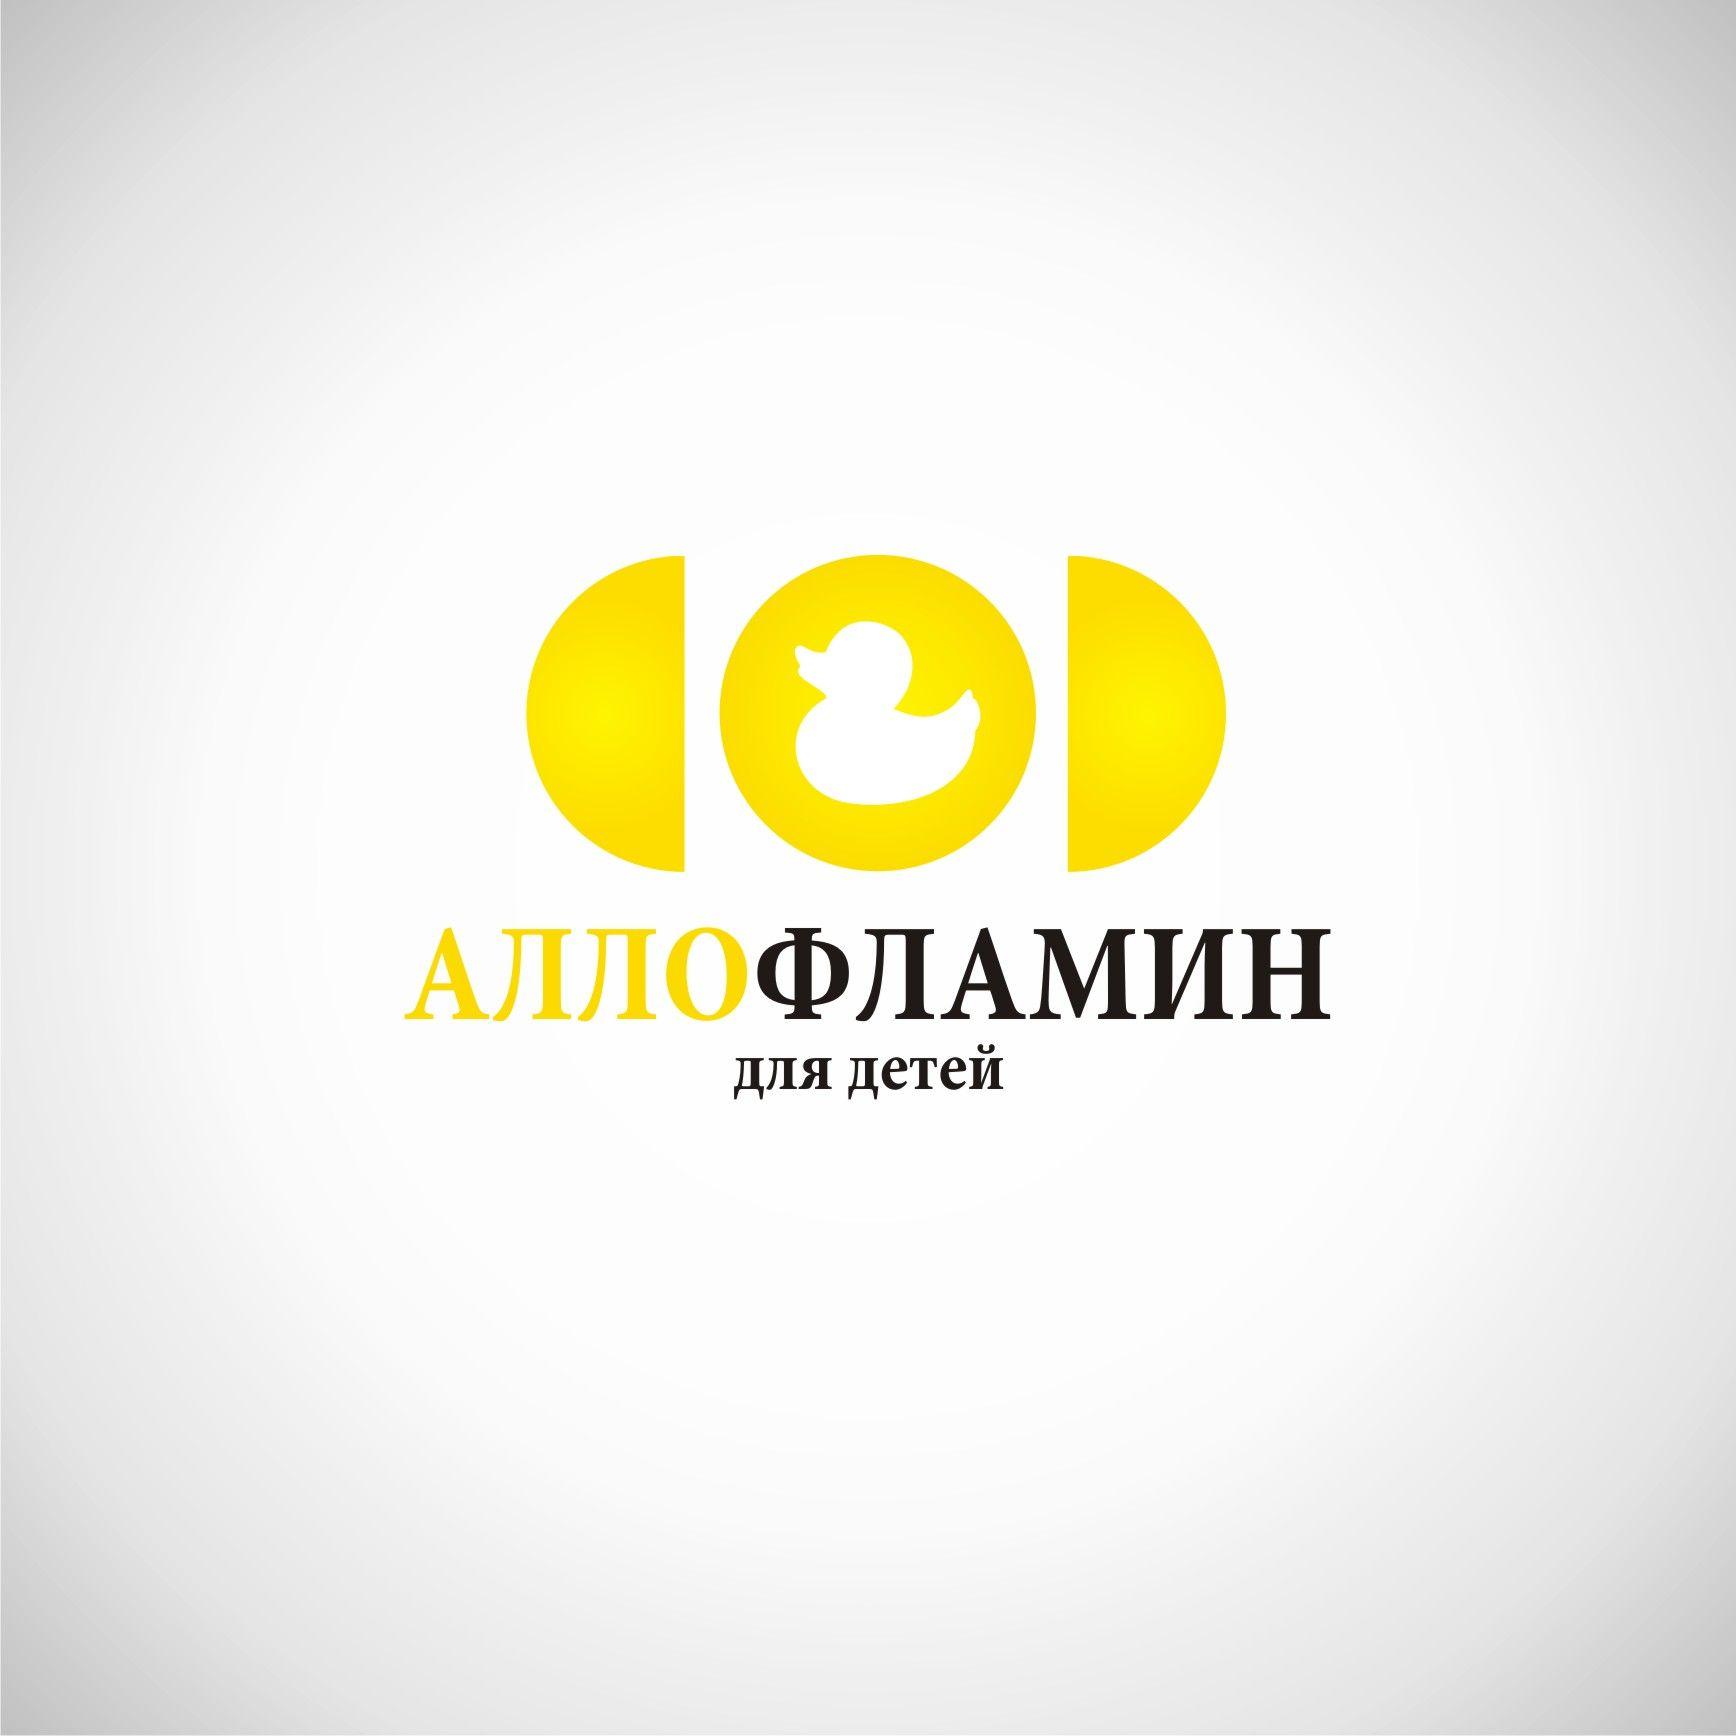 Логотип препарата Аллофламин - дизайнер Tatiana